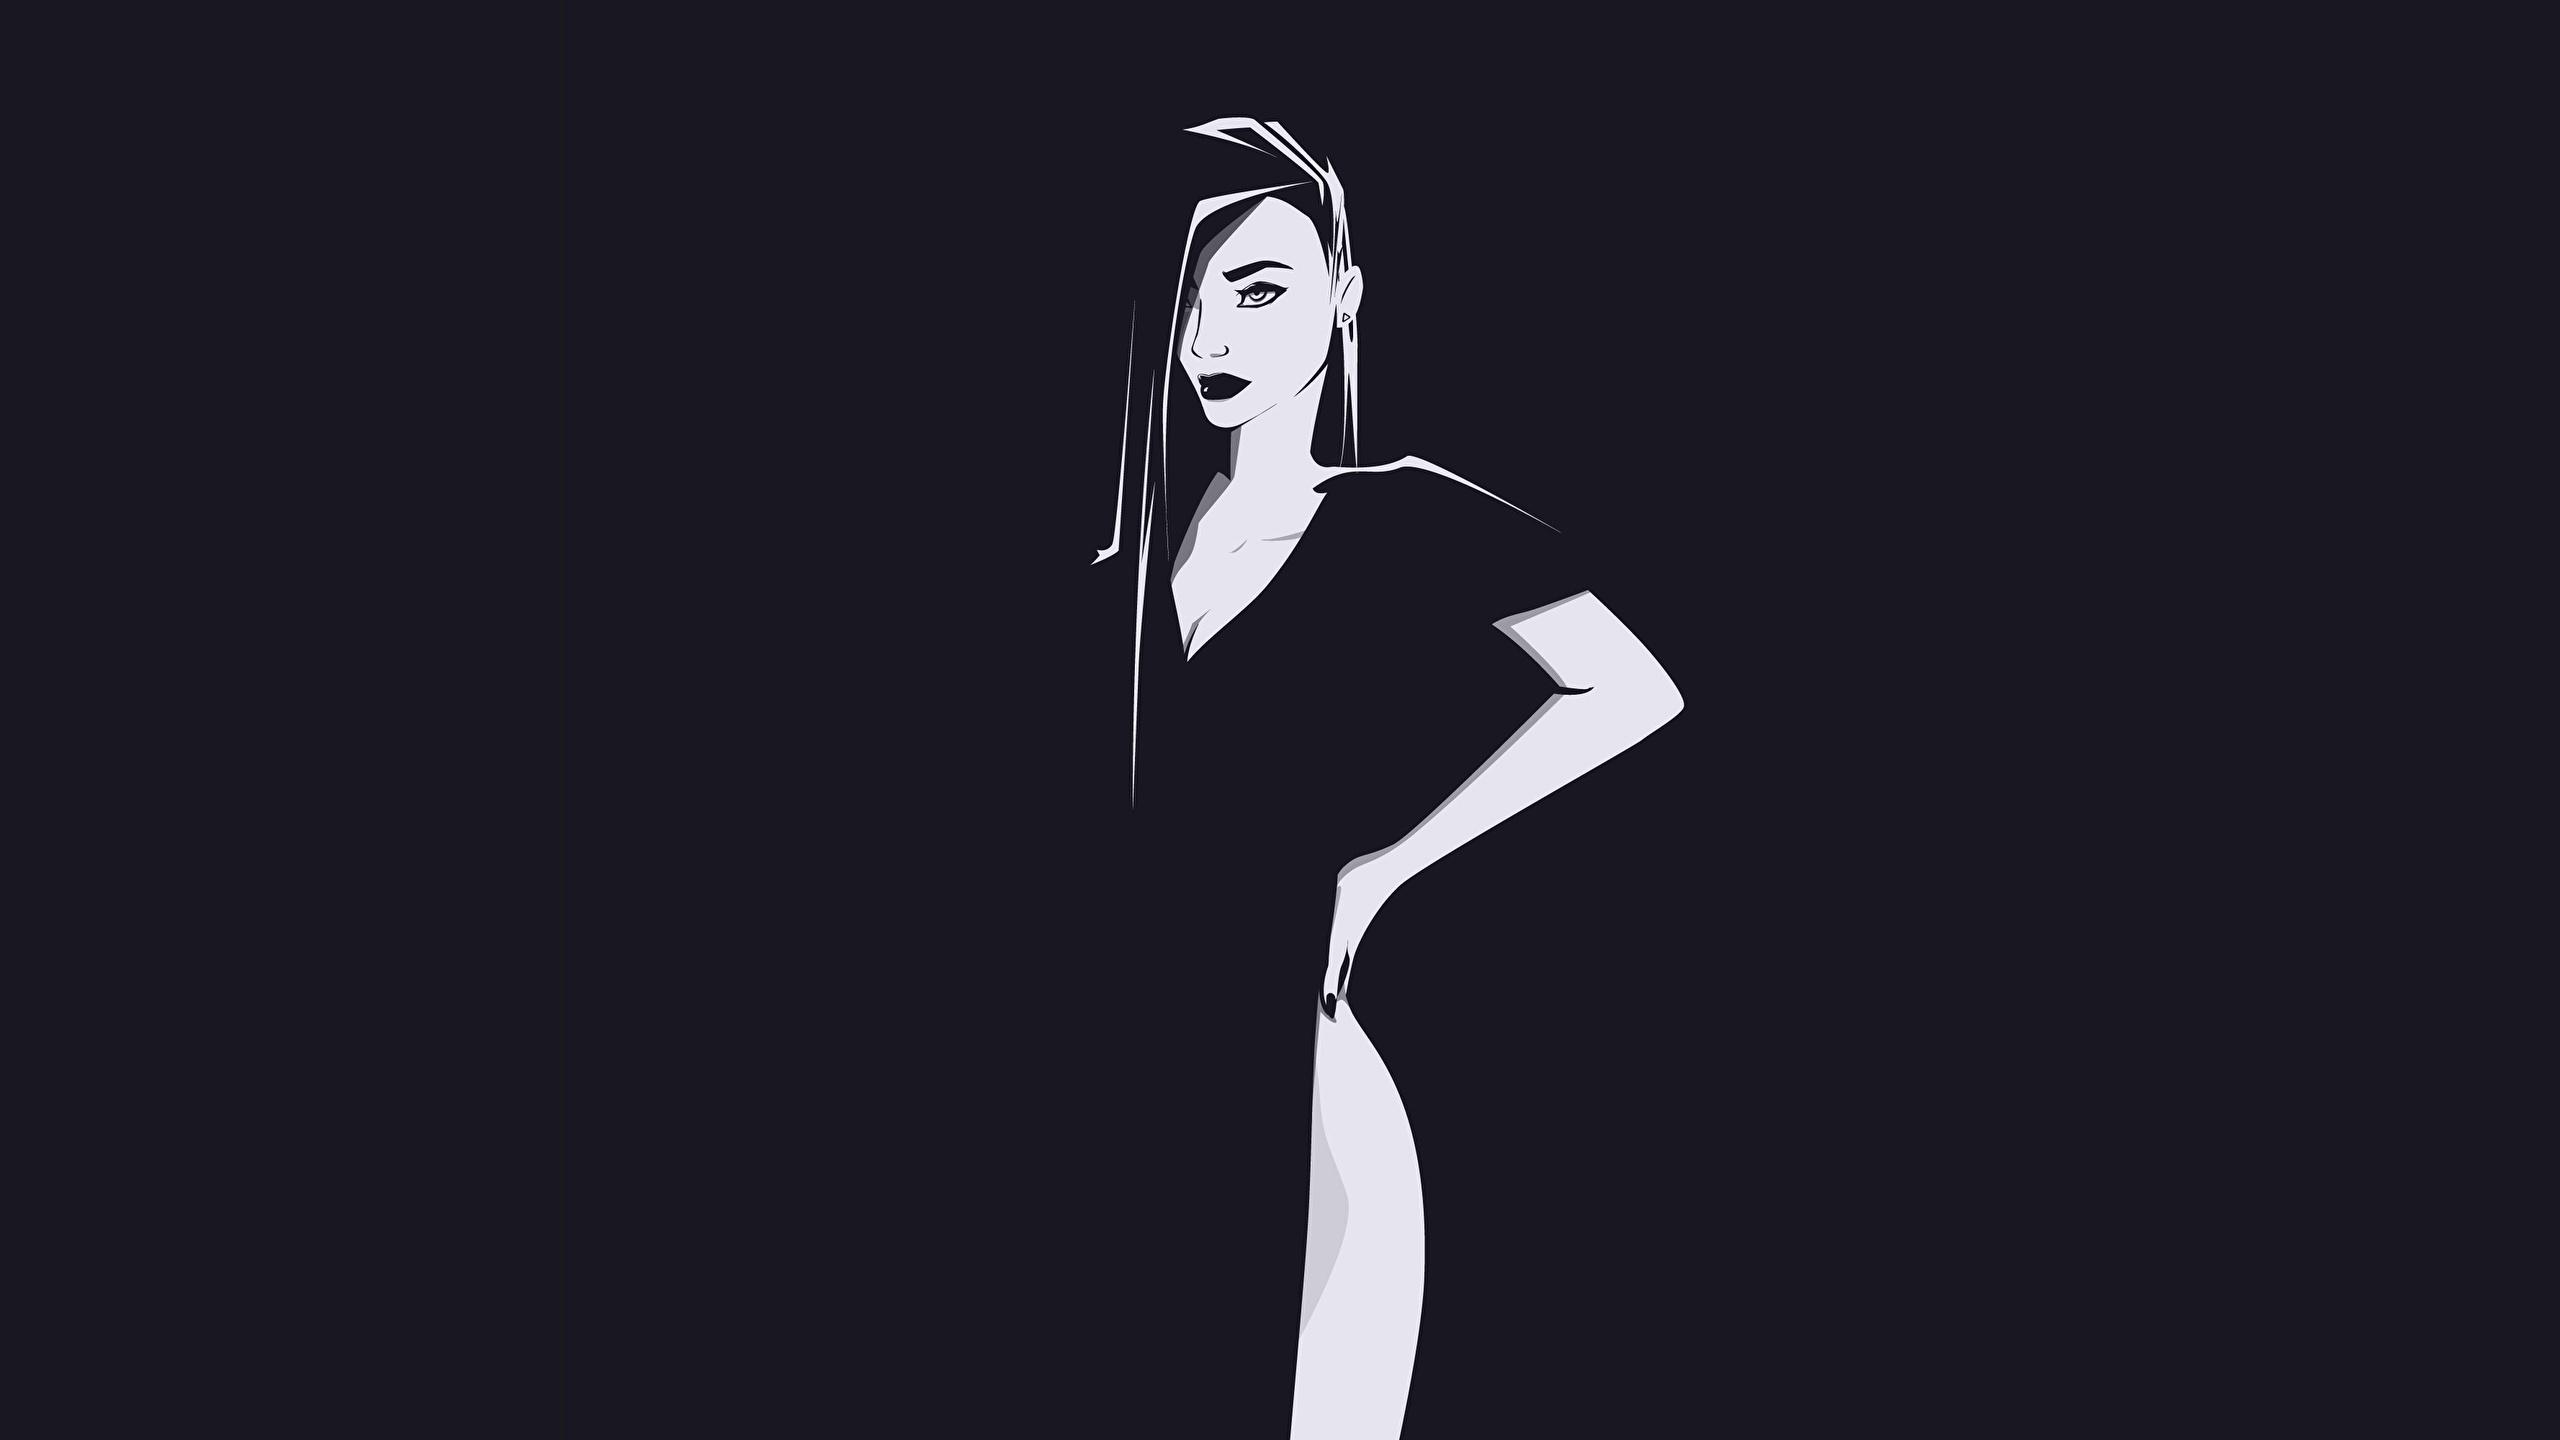 General 2560x1440 silhouette vector art black white minimalism